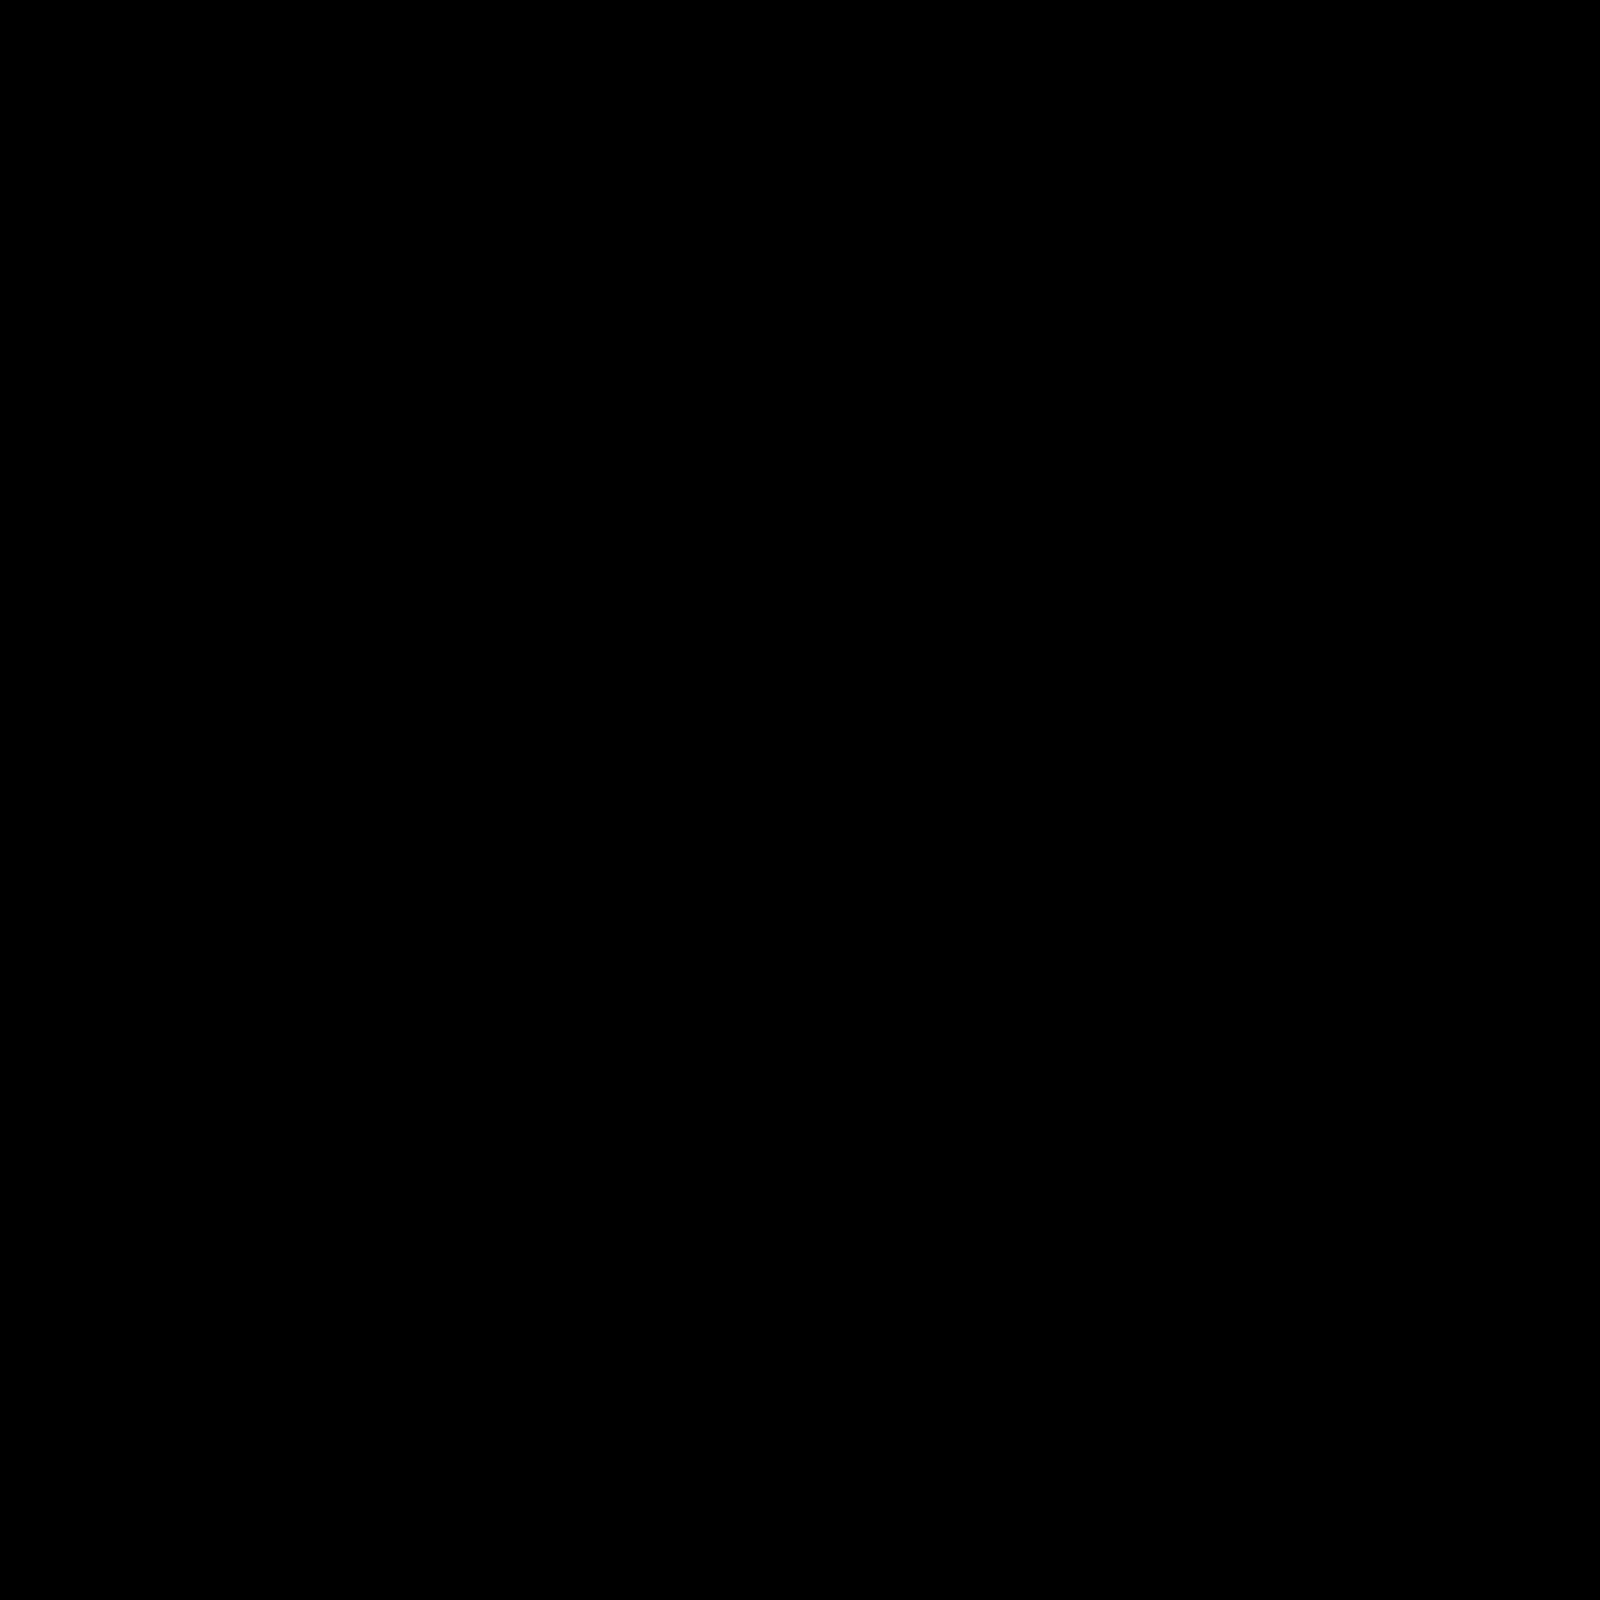 Language Filled icon